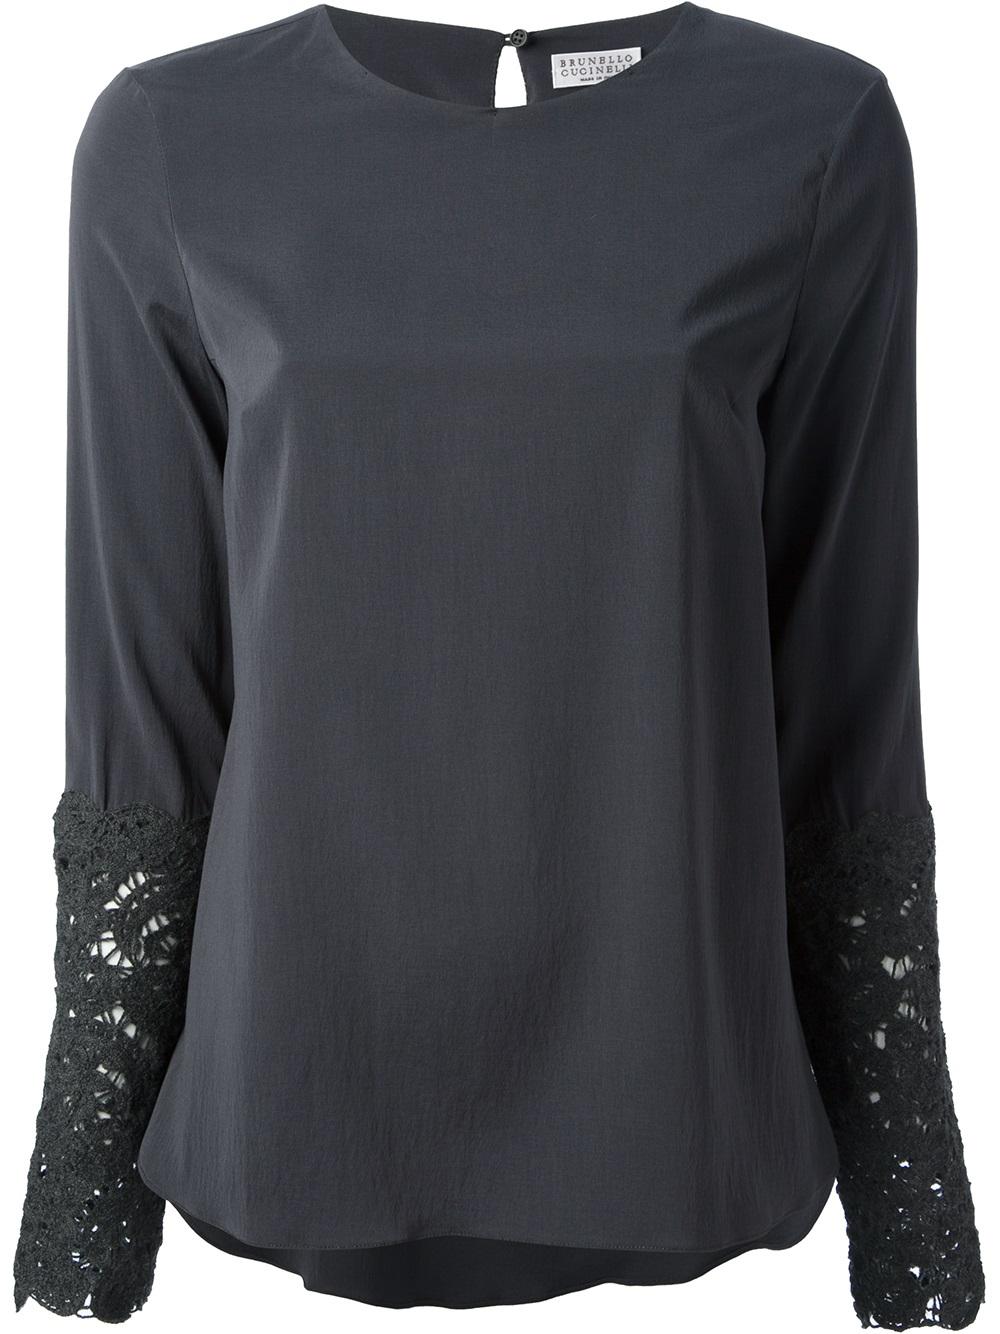 d14ad0f9bd Lyst - Brunello Cucinelli Lace Cuff Blouse in Gray